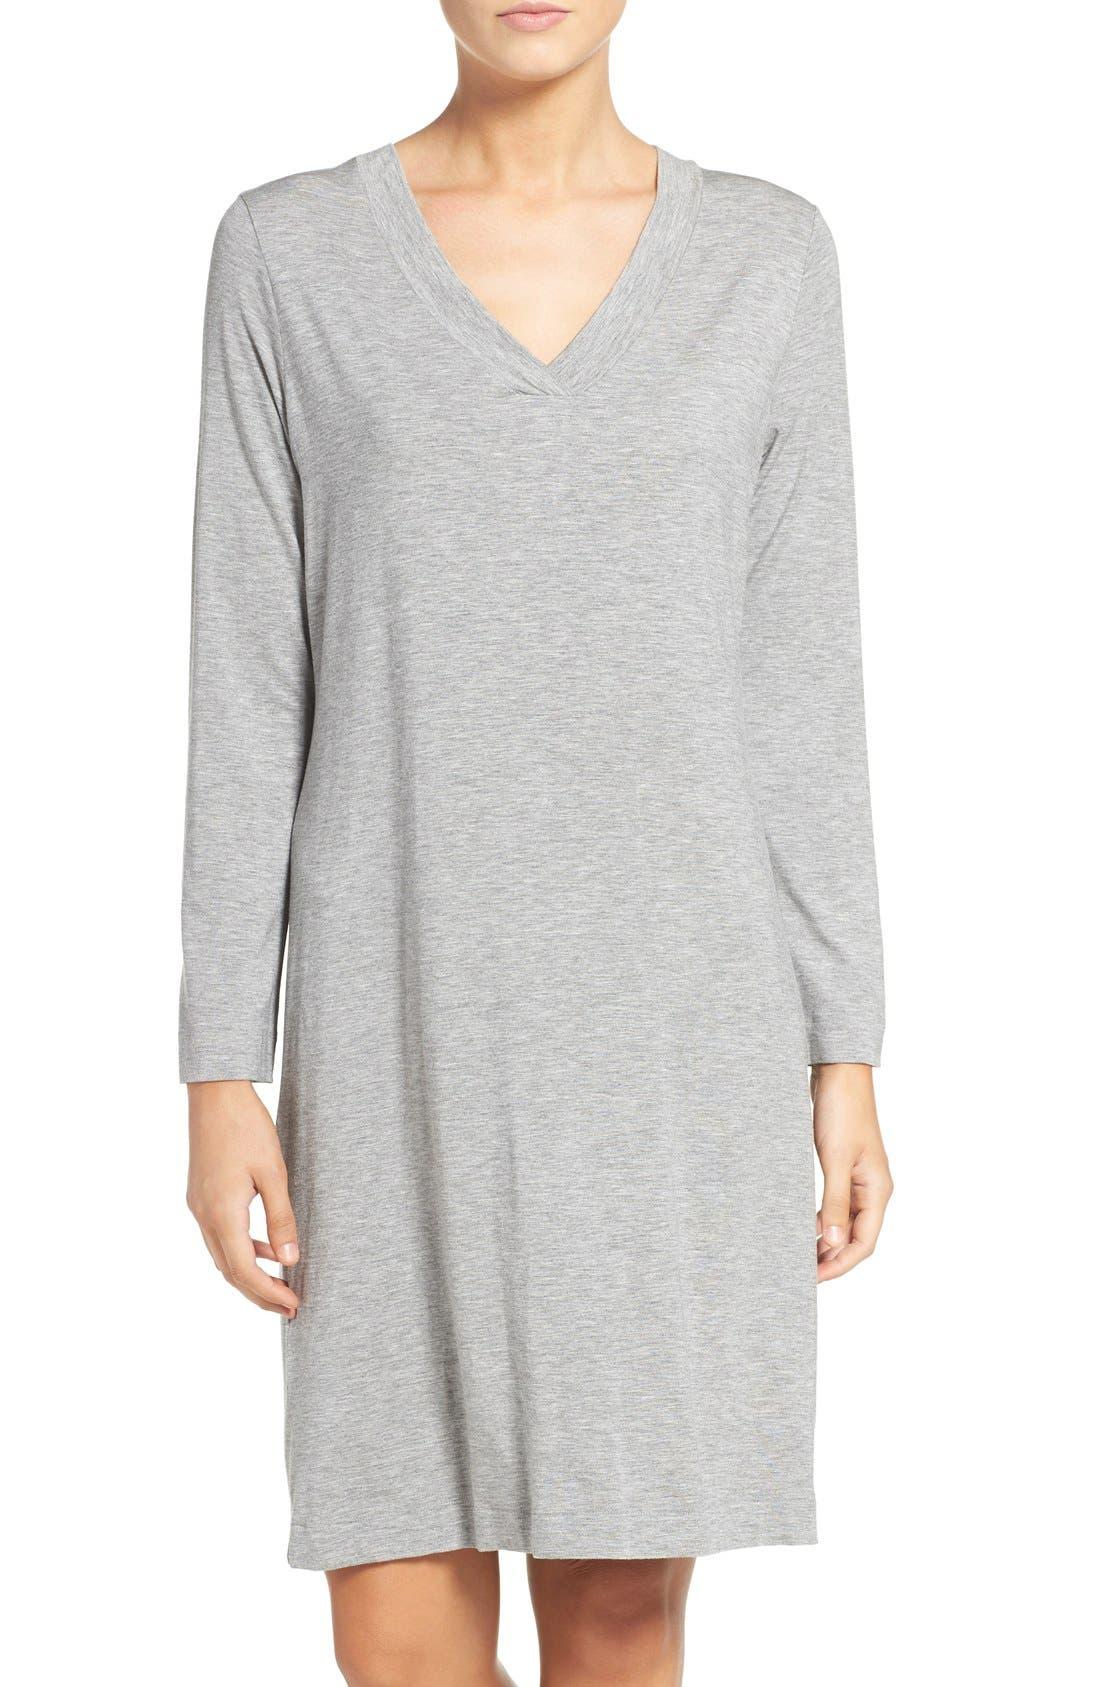 Long Sleeve Knit Nightgown,                             Main thumbnail 1, color,                             025